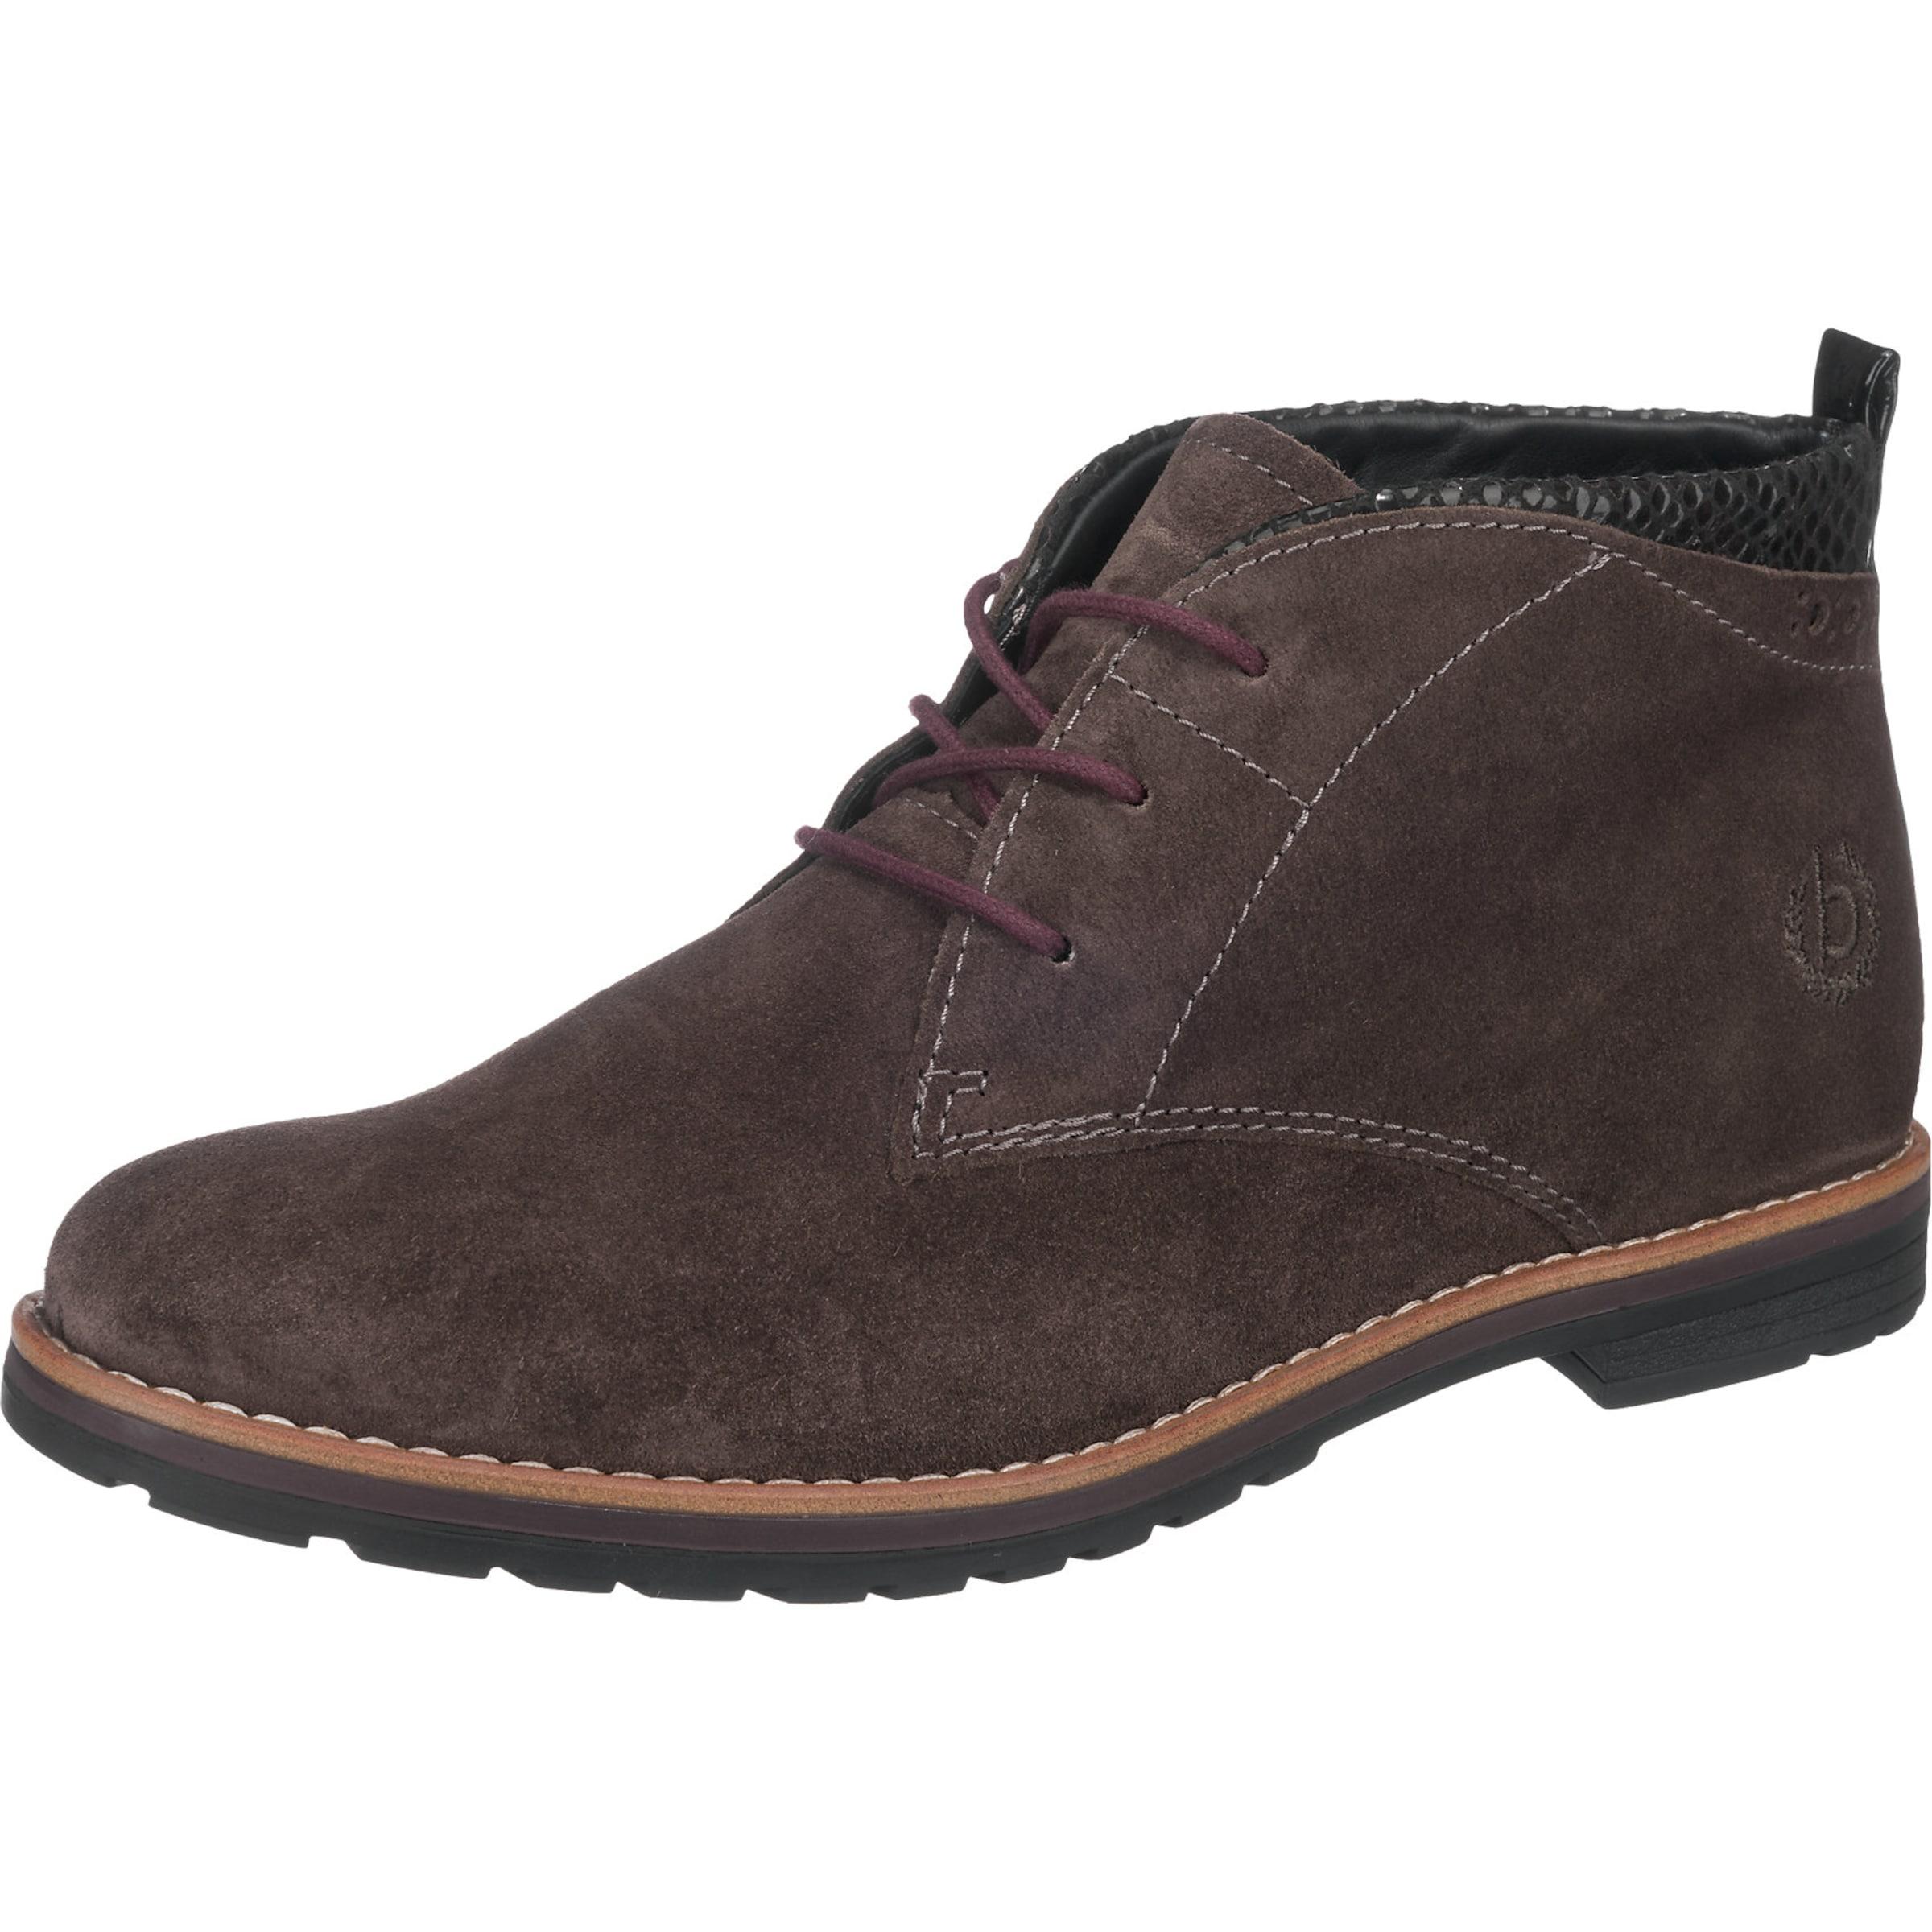 Haltbare Mode billige Schuhe bugatti | Boots Schuhe Gut getragene Schuhe